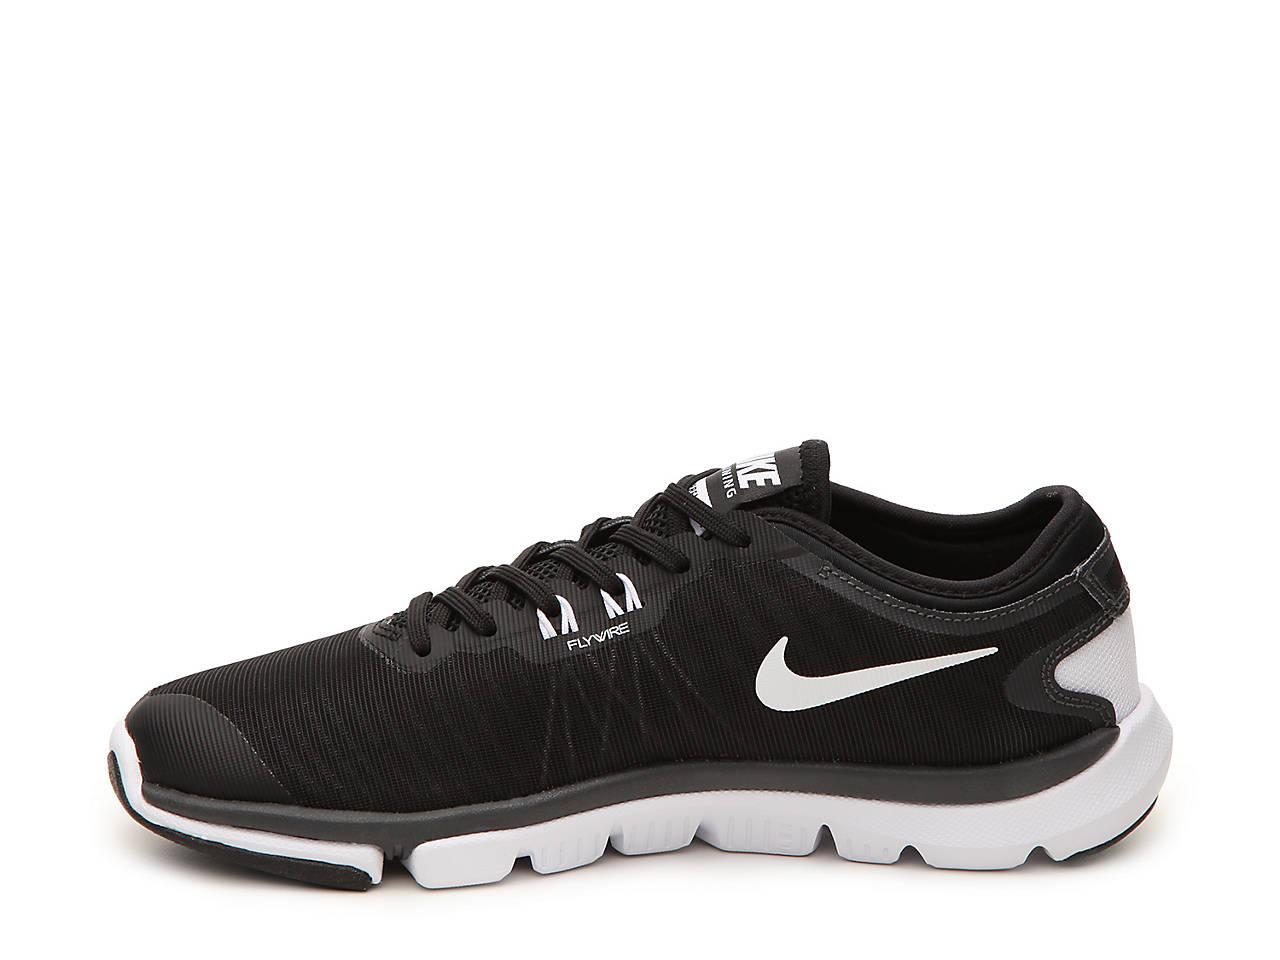 Barato Nike Nike Nike Darwin Caribe Salida 28b490